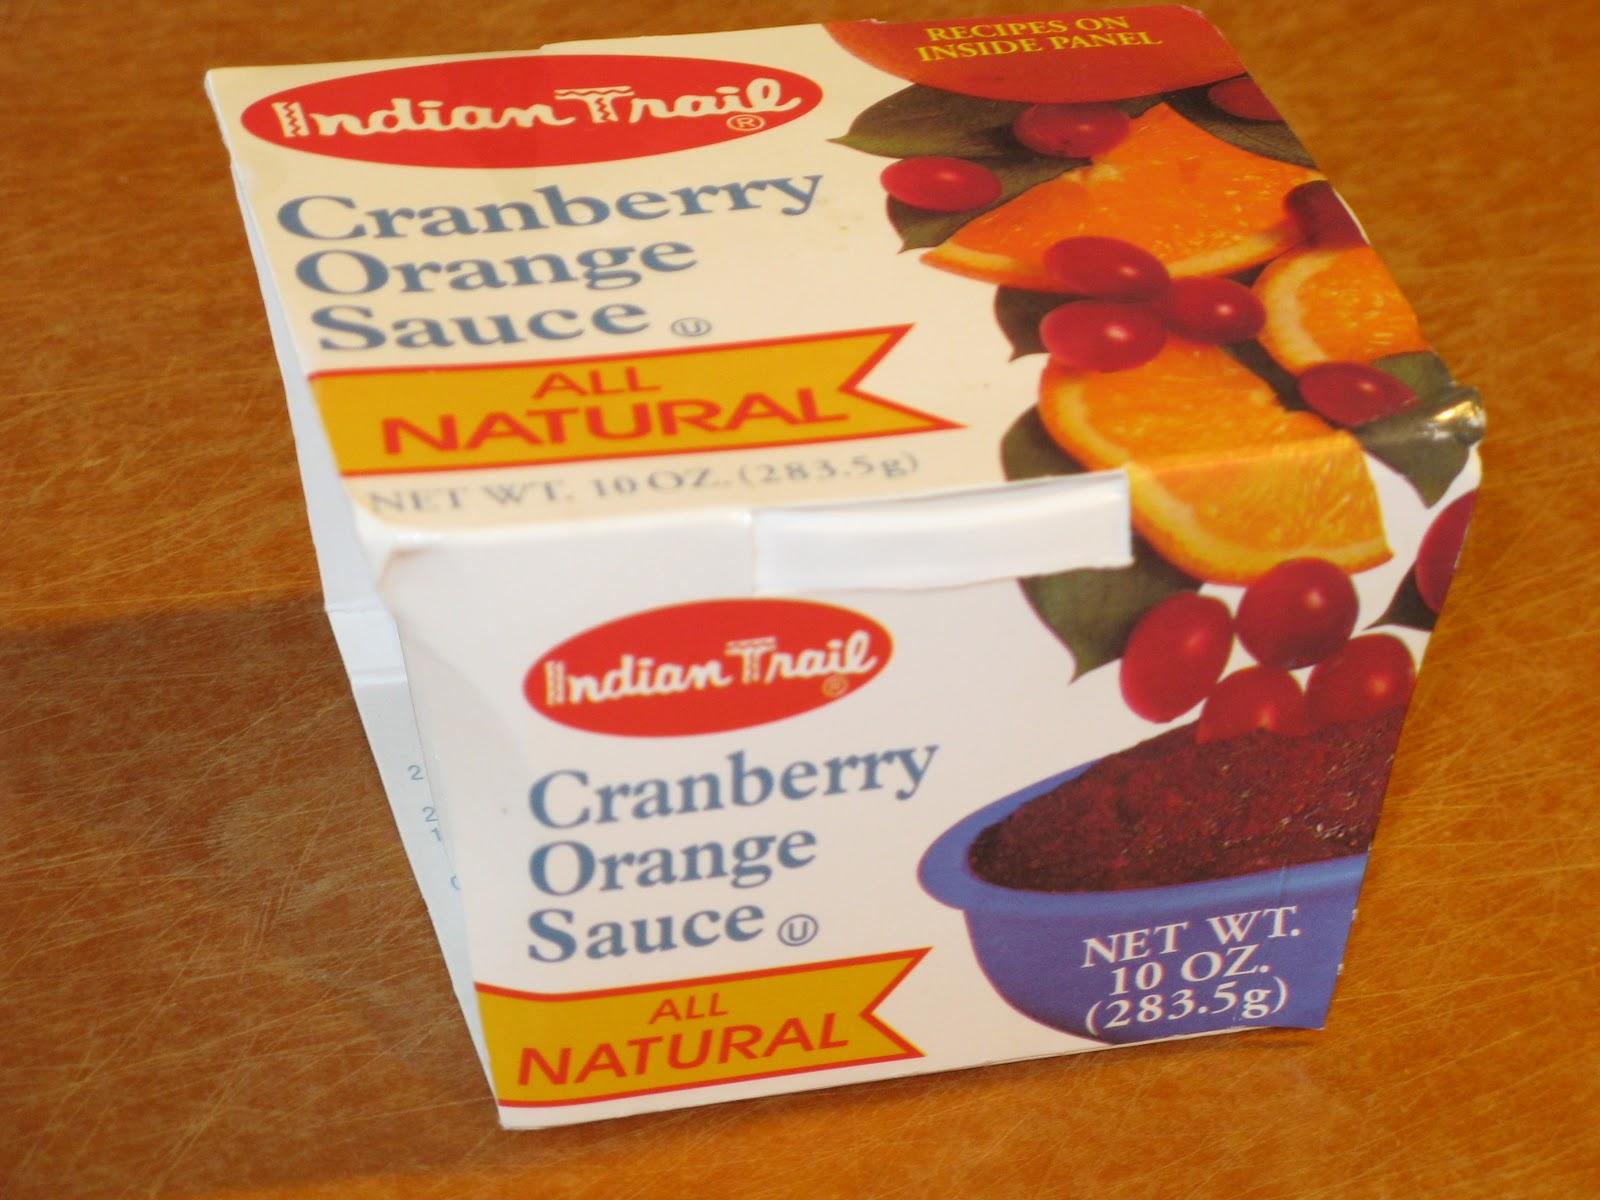 Cora's Recipe for (Almost Indian Trail) Cranberry Orange Sauce